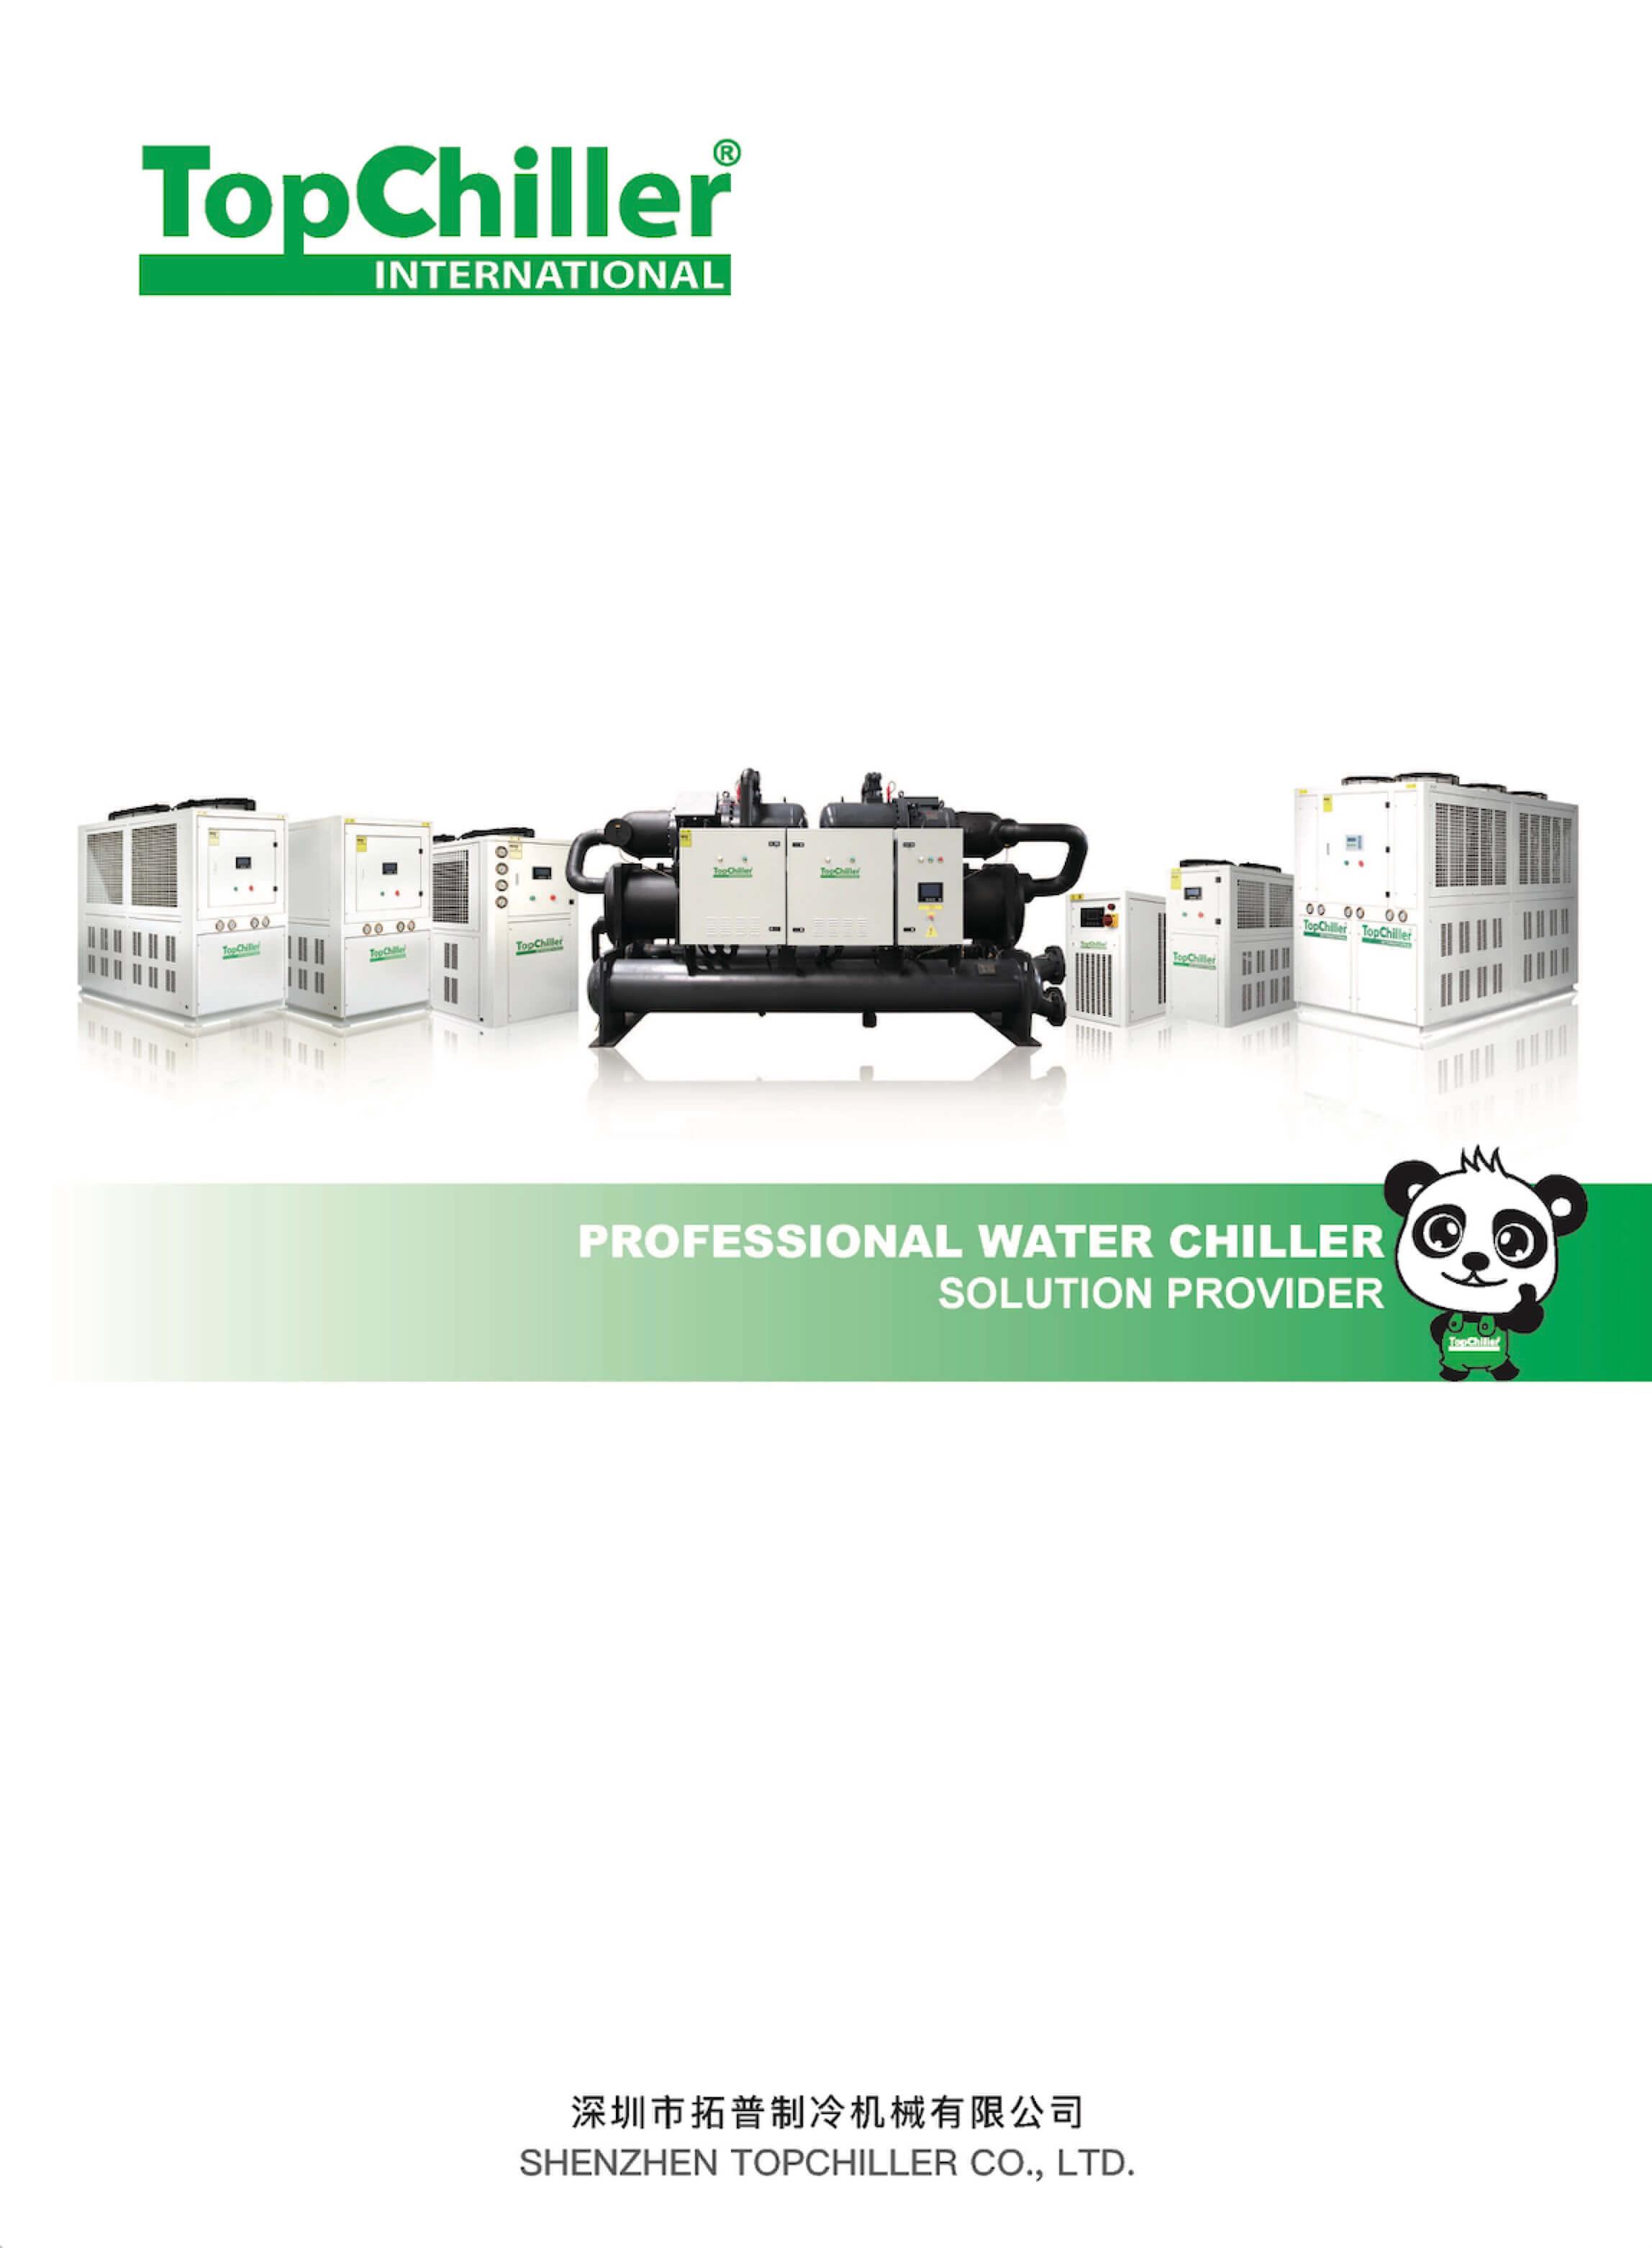 TopChiller Product Catalog